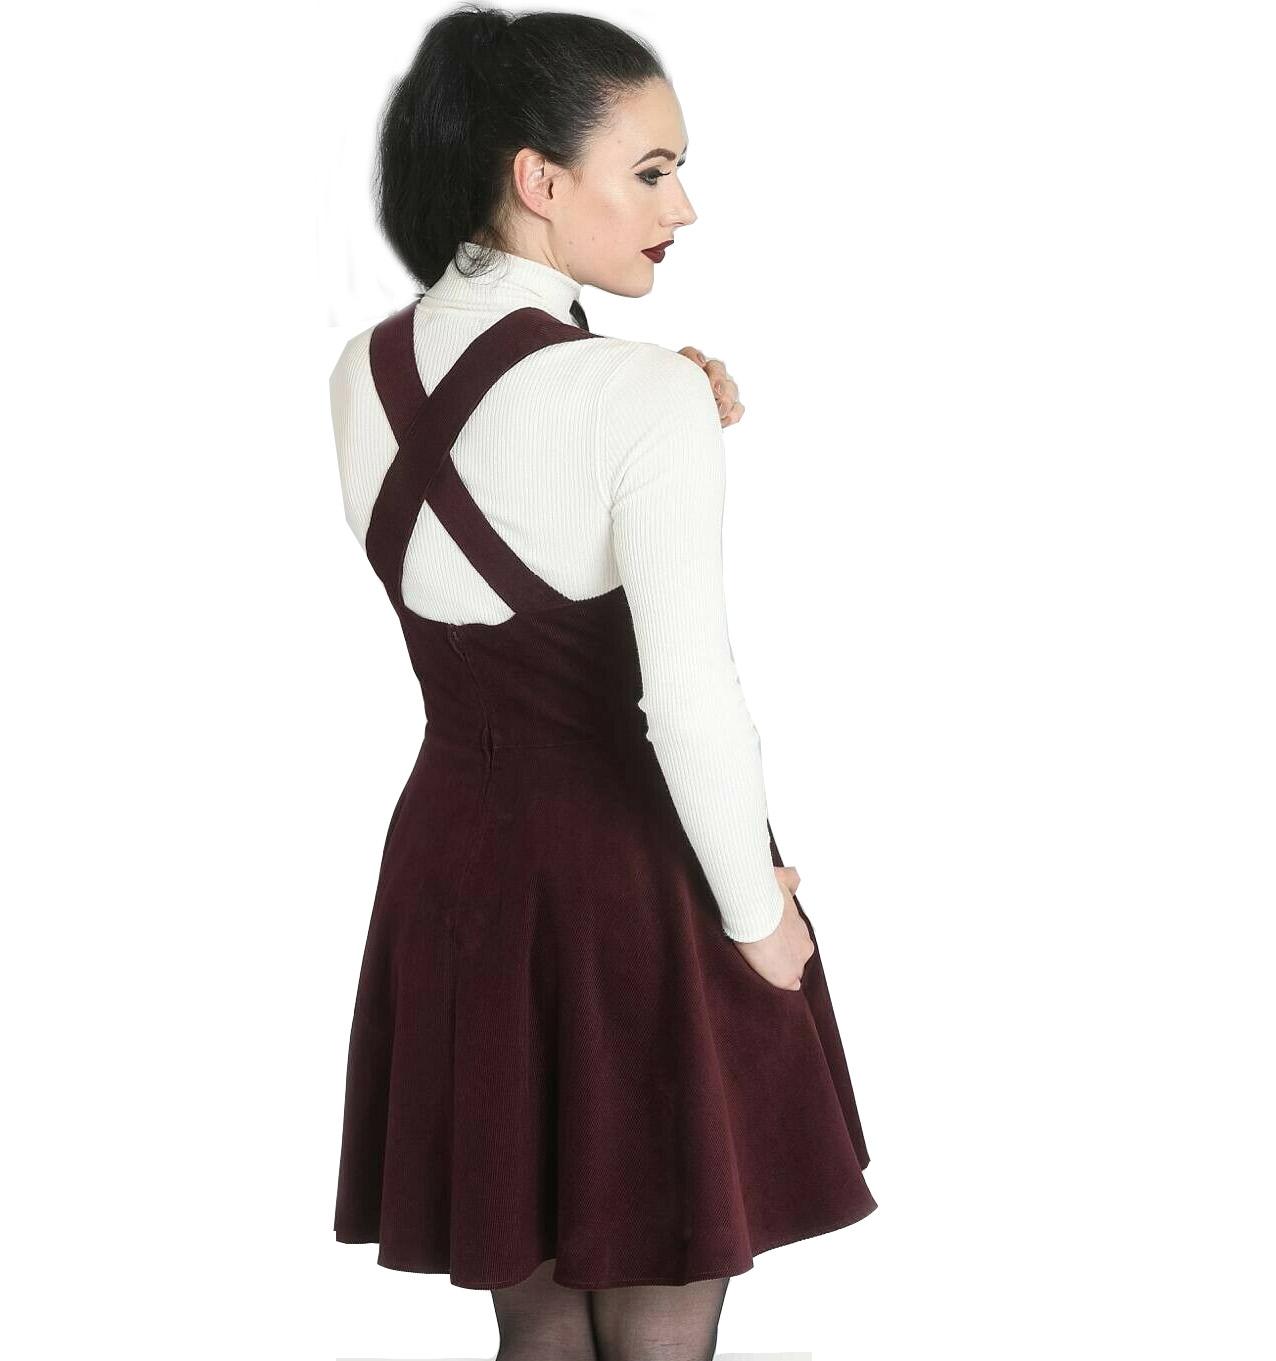 Hell-Bunny-Rockabilly-Corduroy-Mini-Dress-WONDER-YEARS-Pinafore-Wine-All-Sizes thumbnail 5